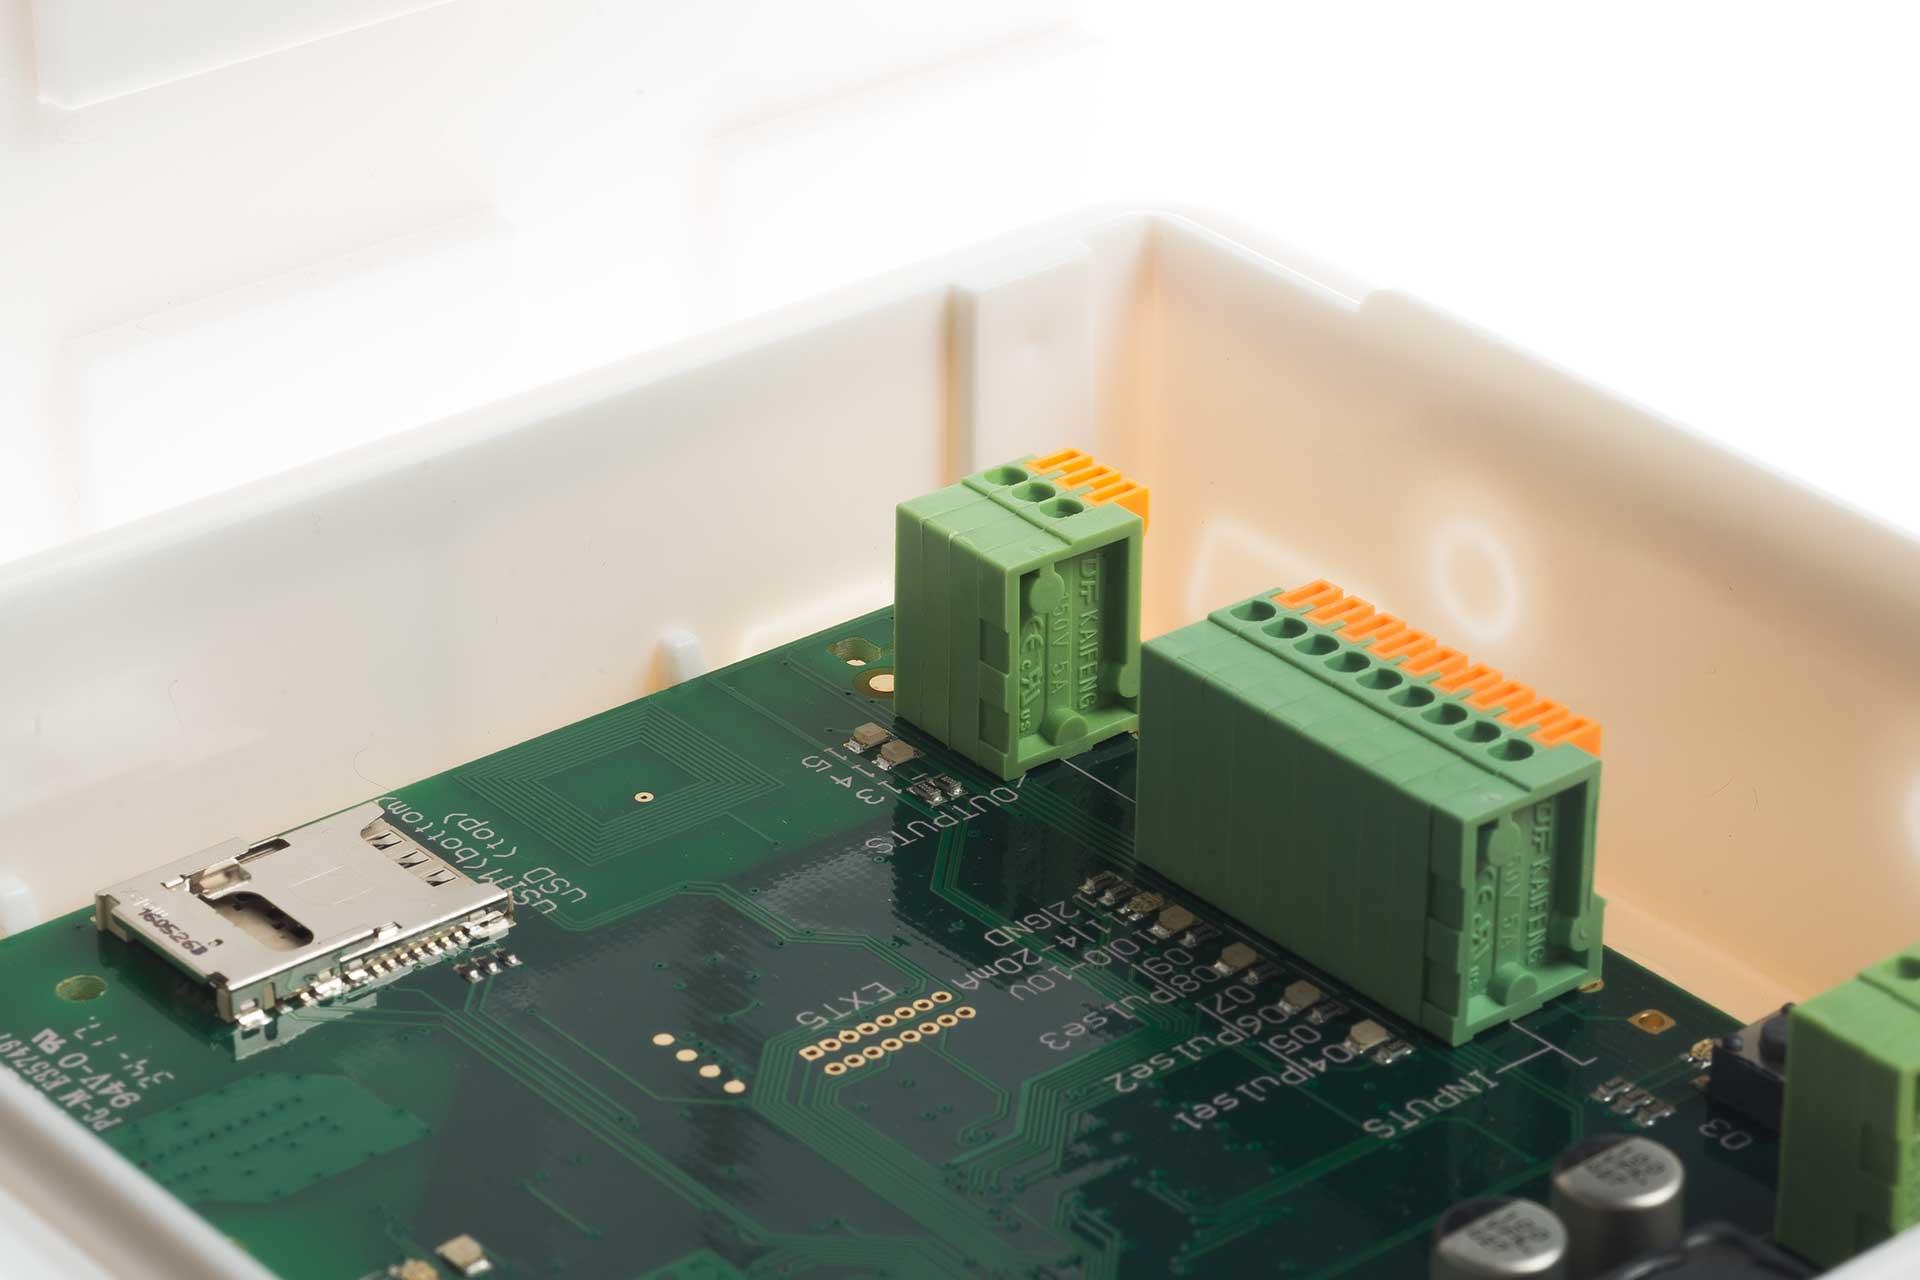 Maxee Gateway motherboard